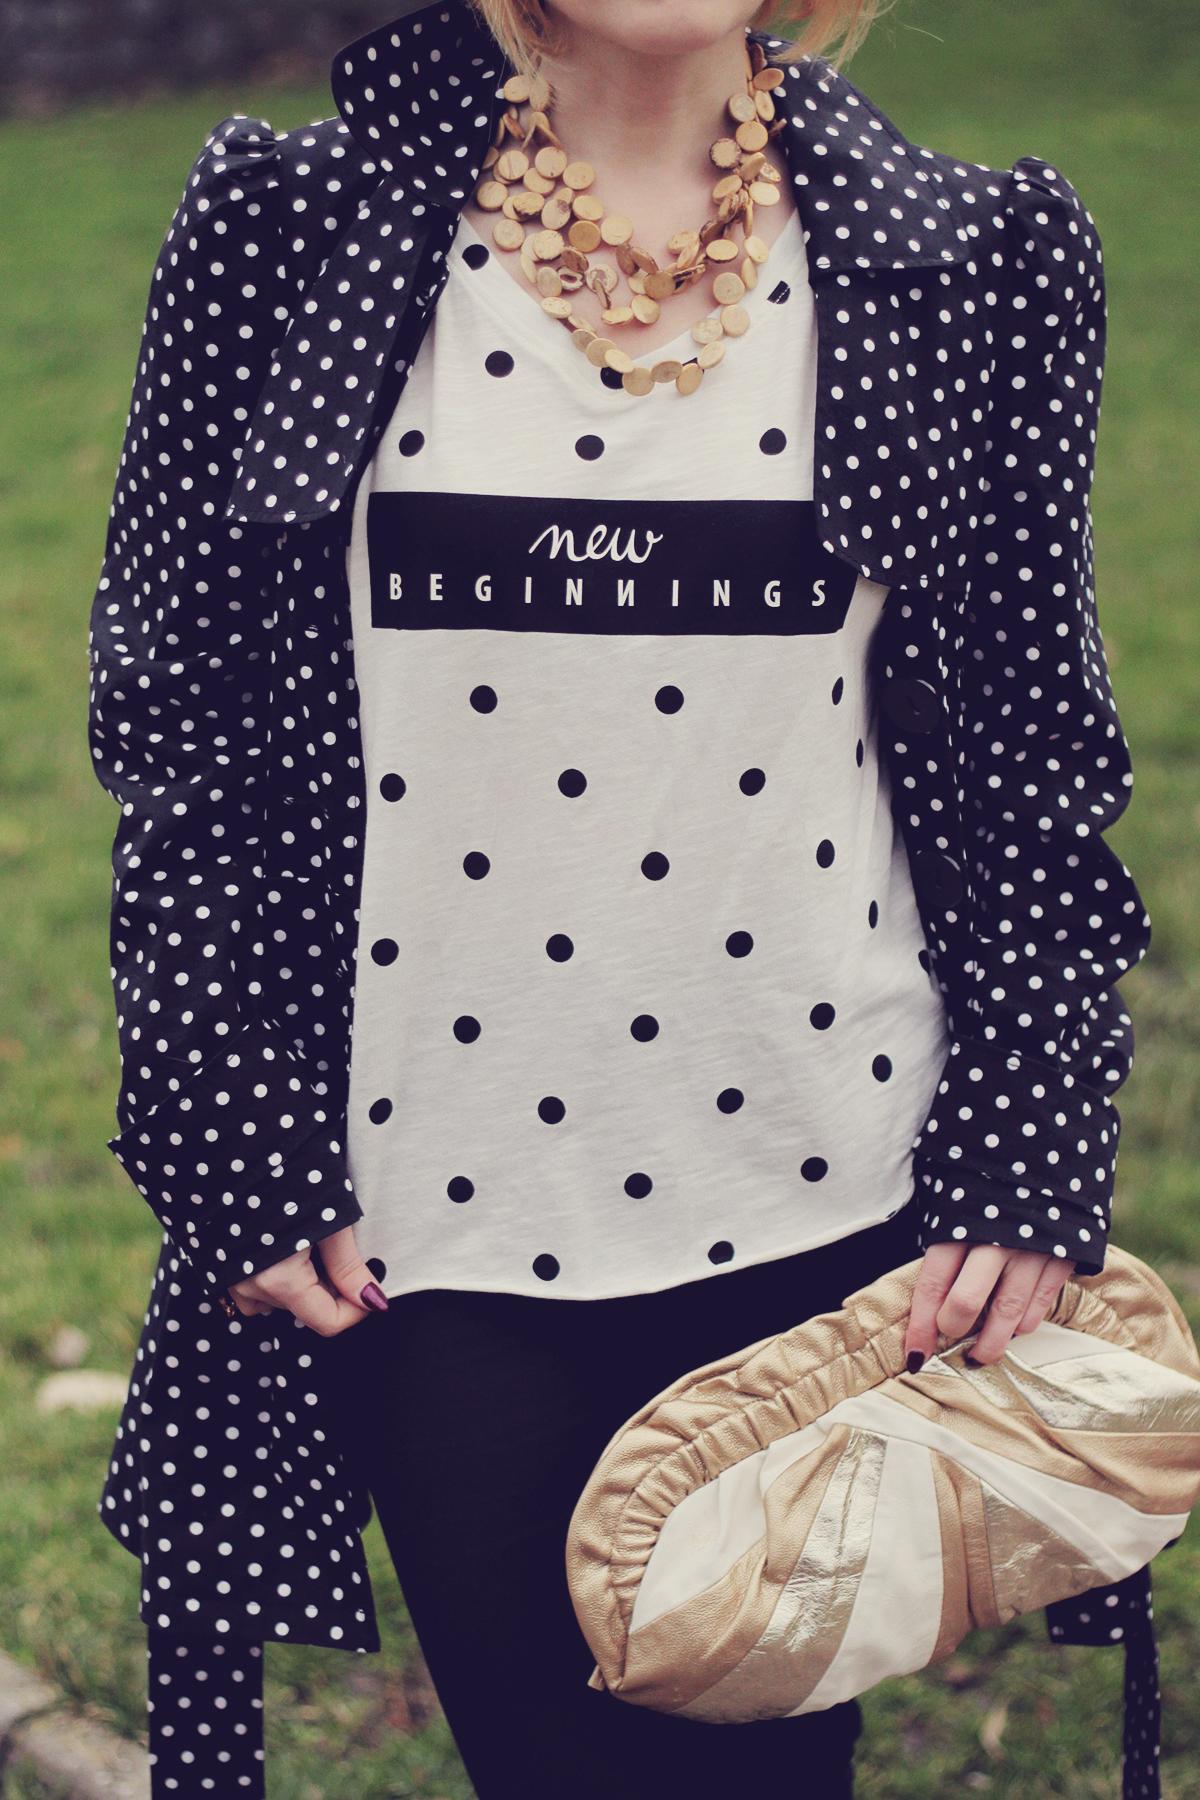 new beginnings polka dot t-shirt